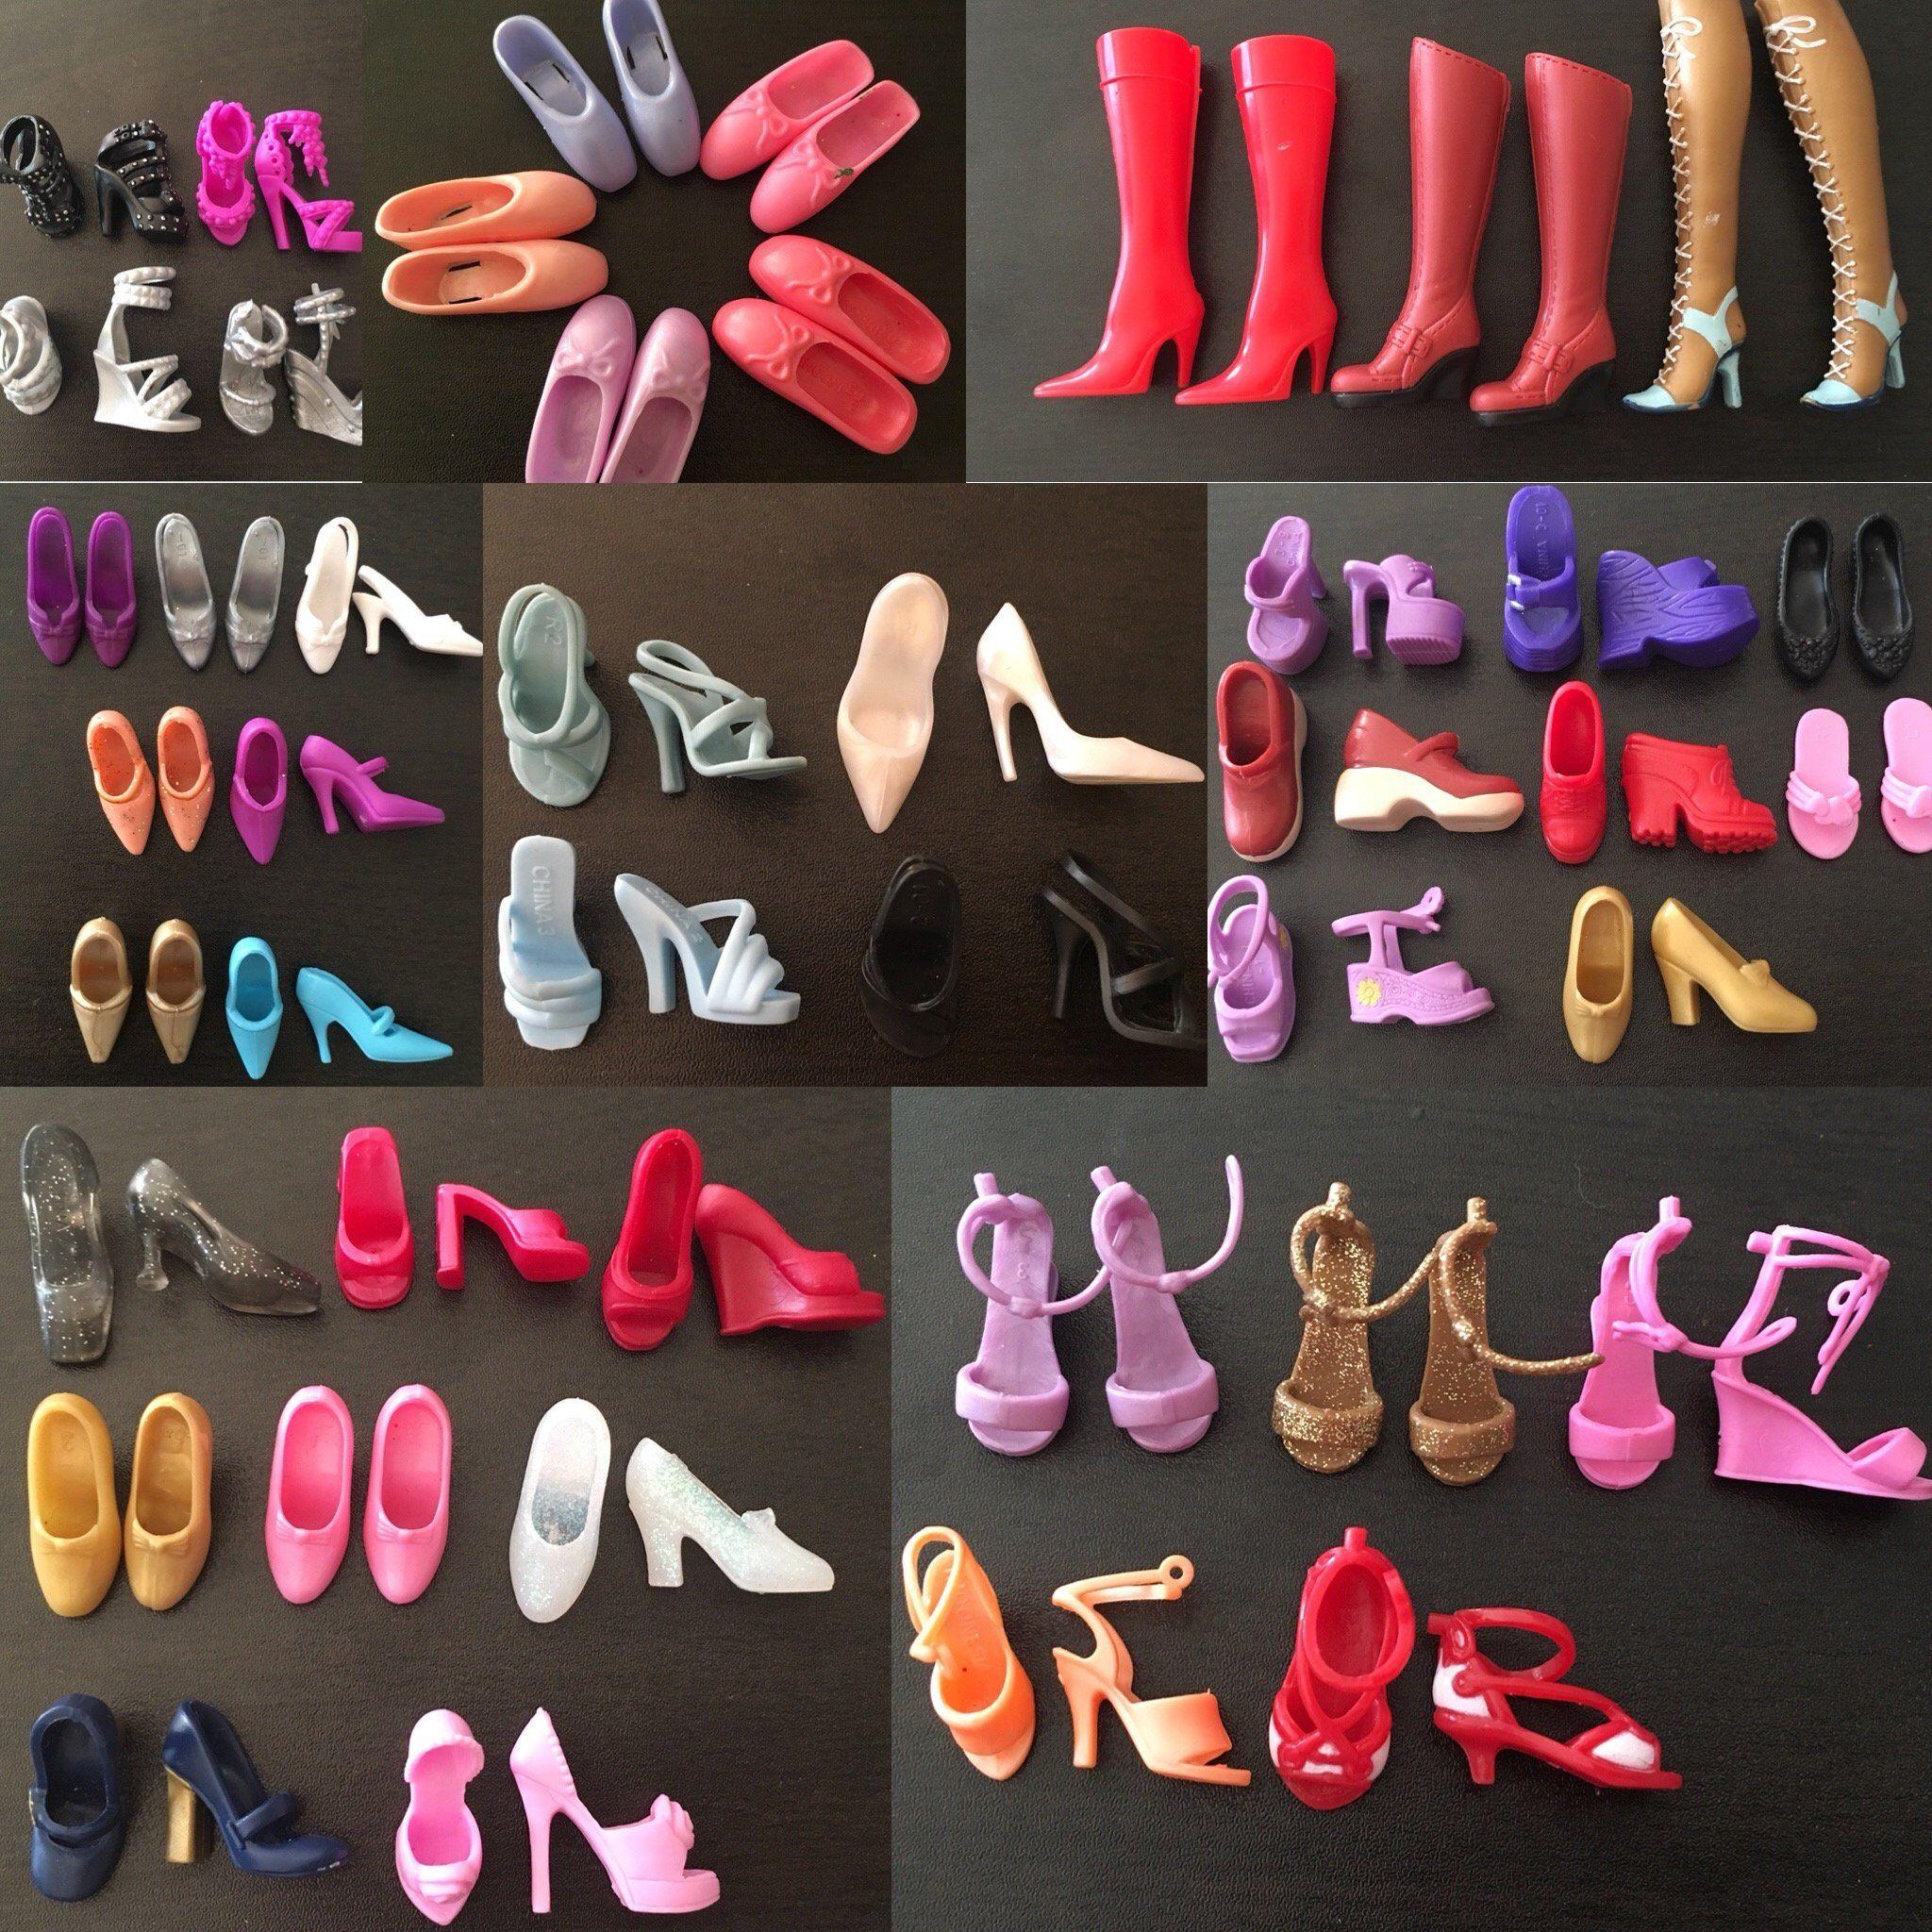 Vintage barbie products